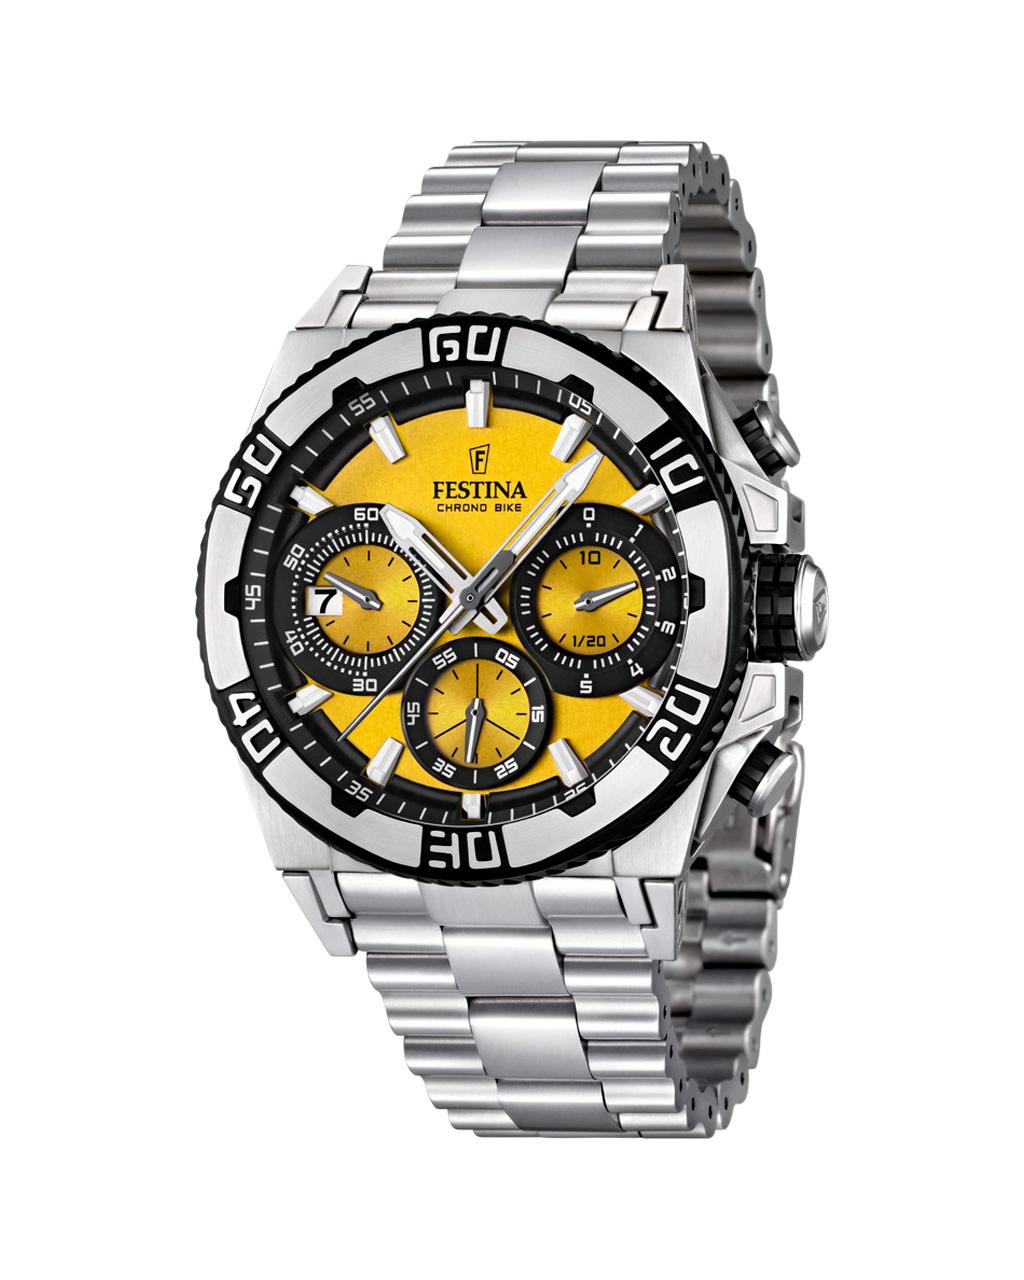 ac6194c36324 Ρολόι FESTINA Chrono Bike F16658 7 Relojes Rolex